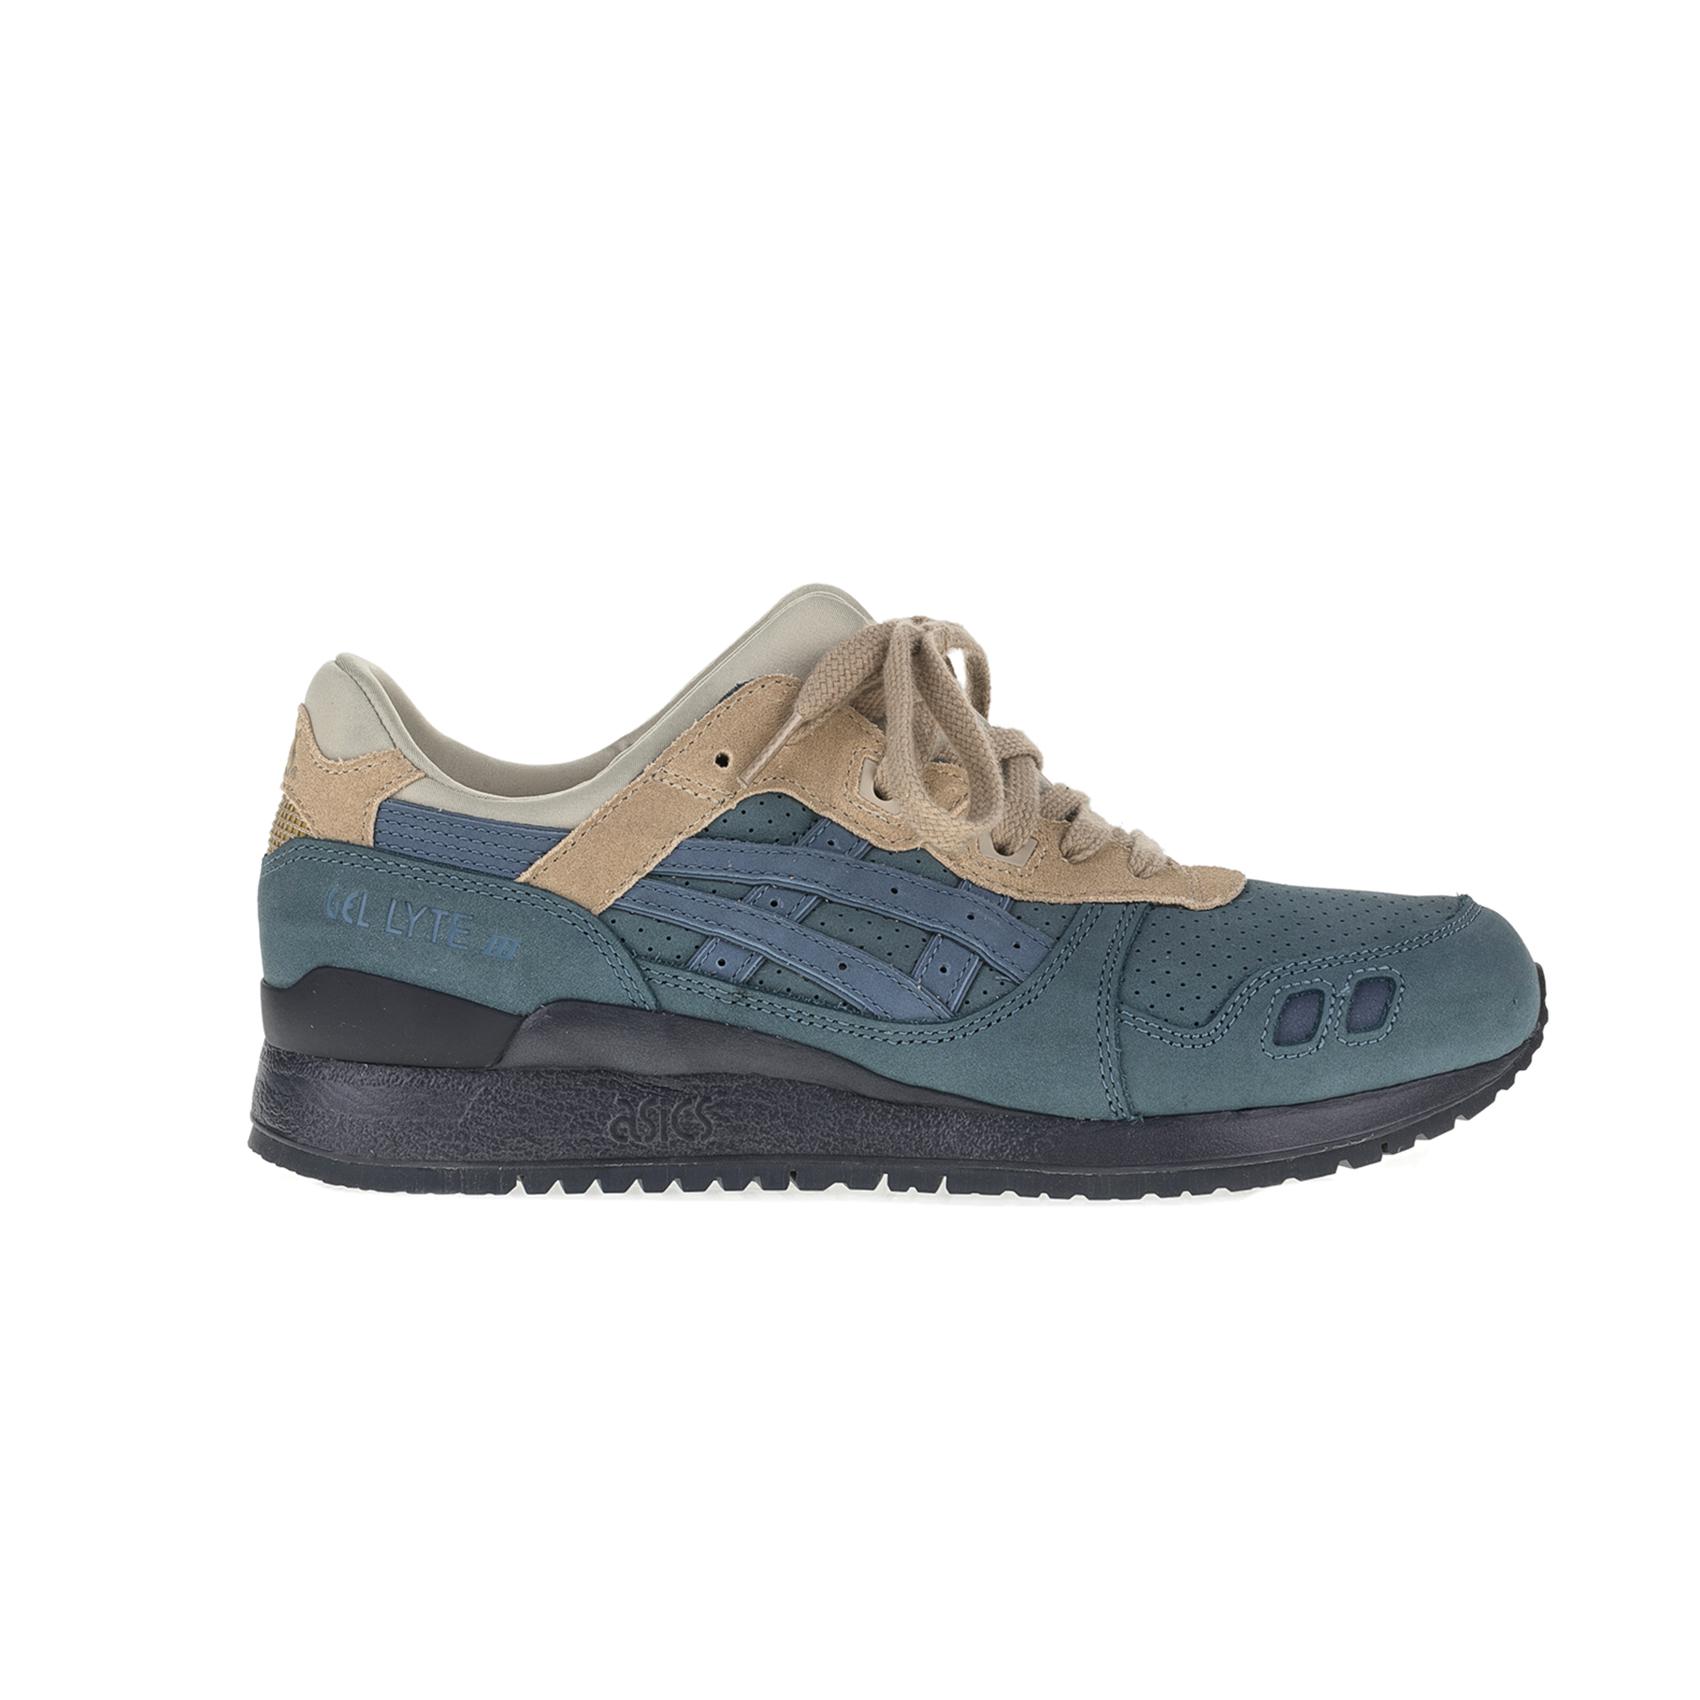 ASICS – Unisex παπούτσια Asics GEL-LYTE III μπλε-μπεζ